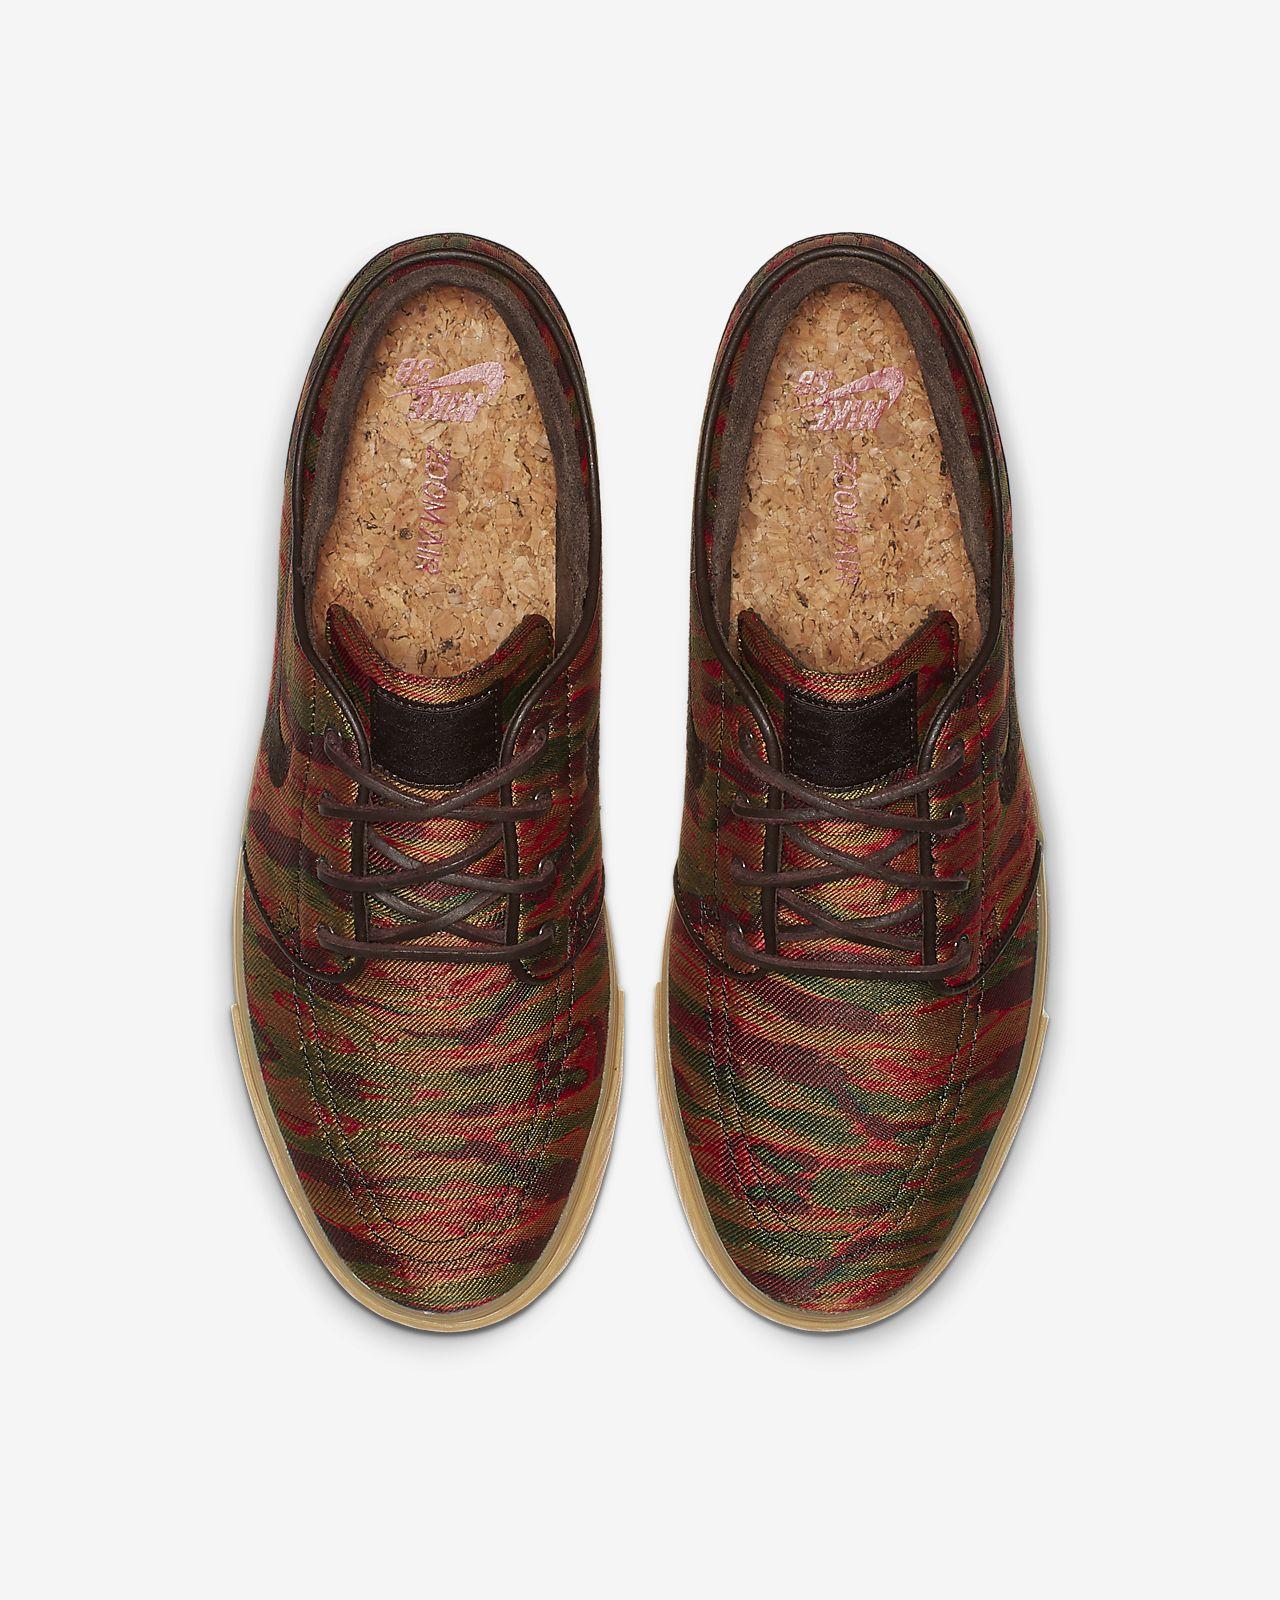 NIKE ZOOM SB Stefan Janoski Canvas Premium Men's New Skate Shoes 705190 900